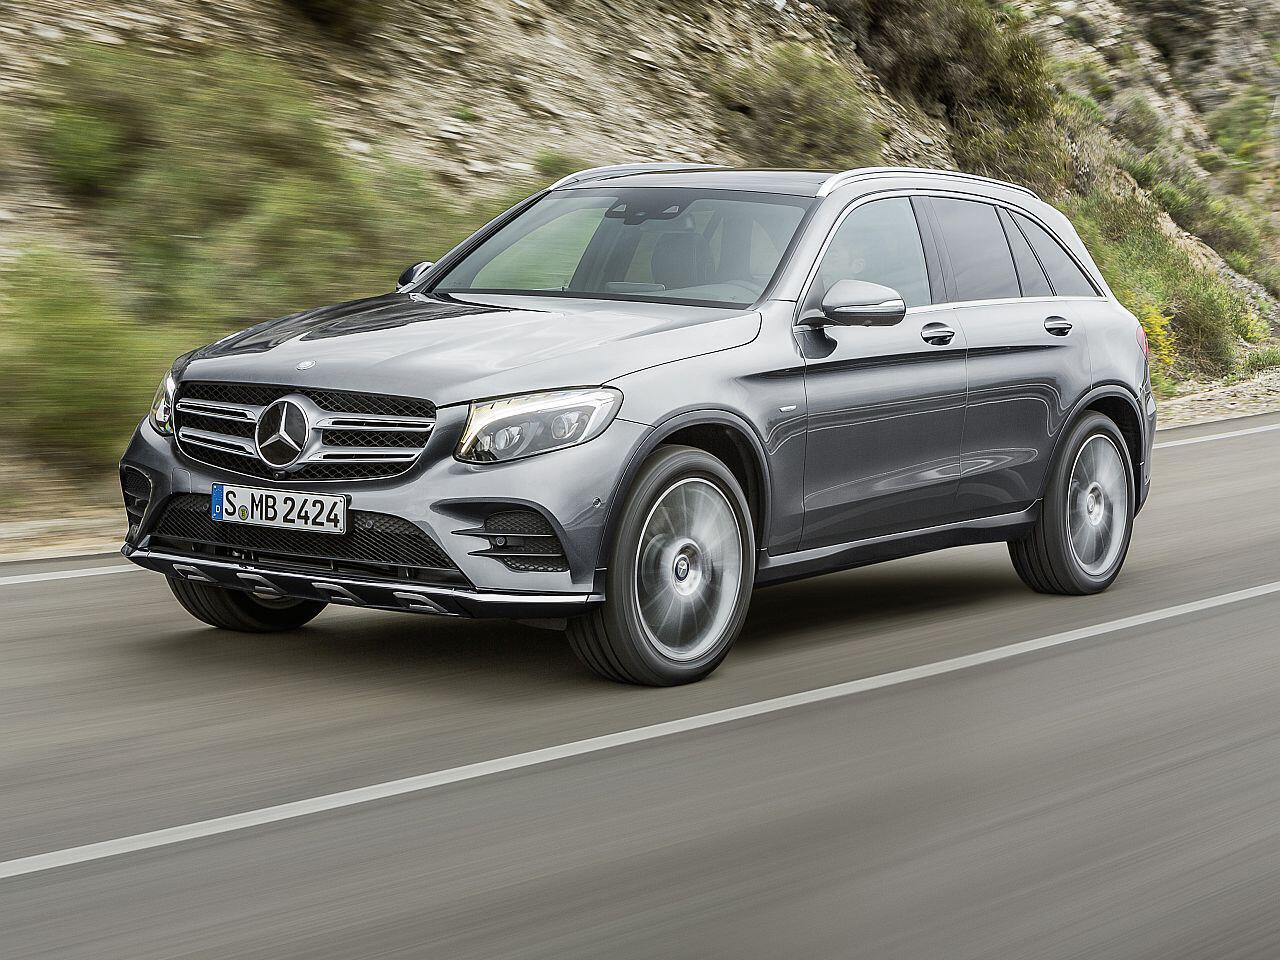 Bild zu Platz 3: Mercedes GLK/GLC